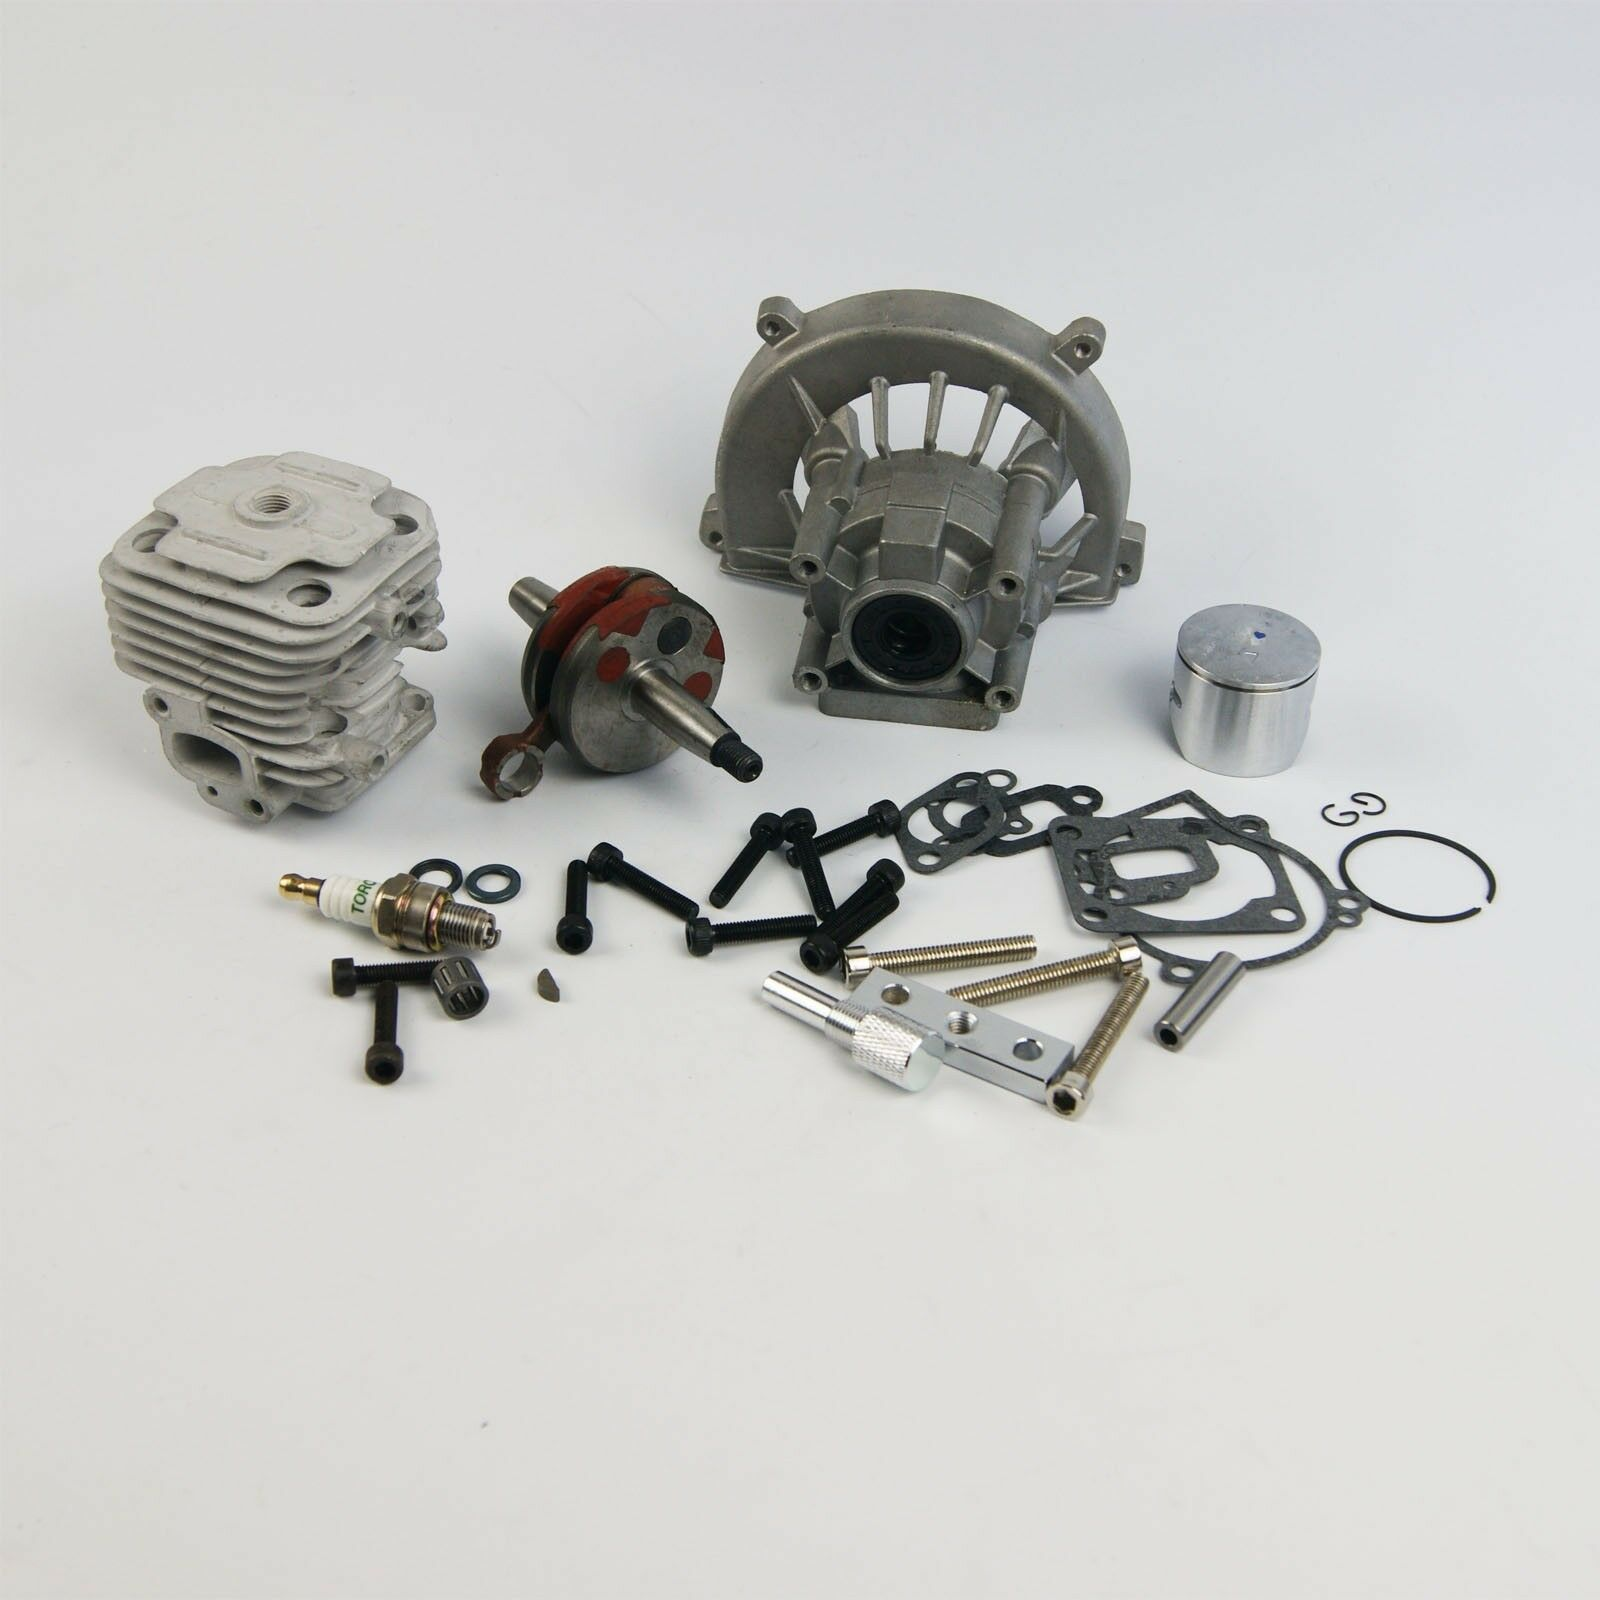 Rovan  4 Bolt 30.5cc Engine Kit fit CY ZENOAH G240 G270 G290RC HPI KM GOPED  risparmia fino al 50%